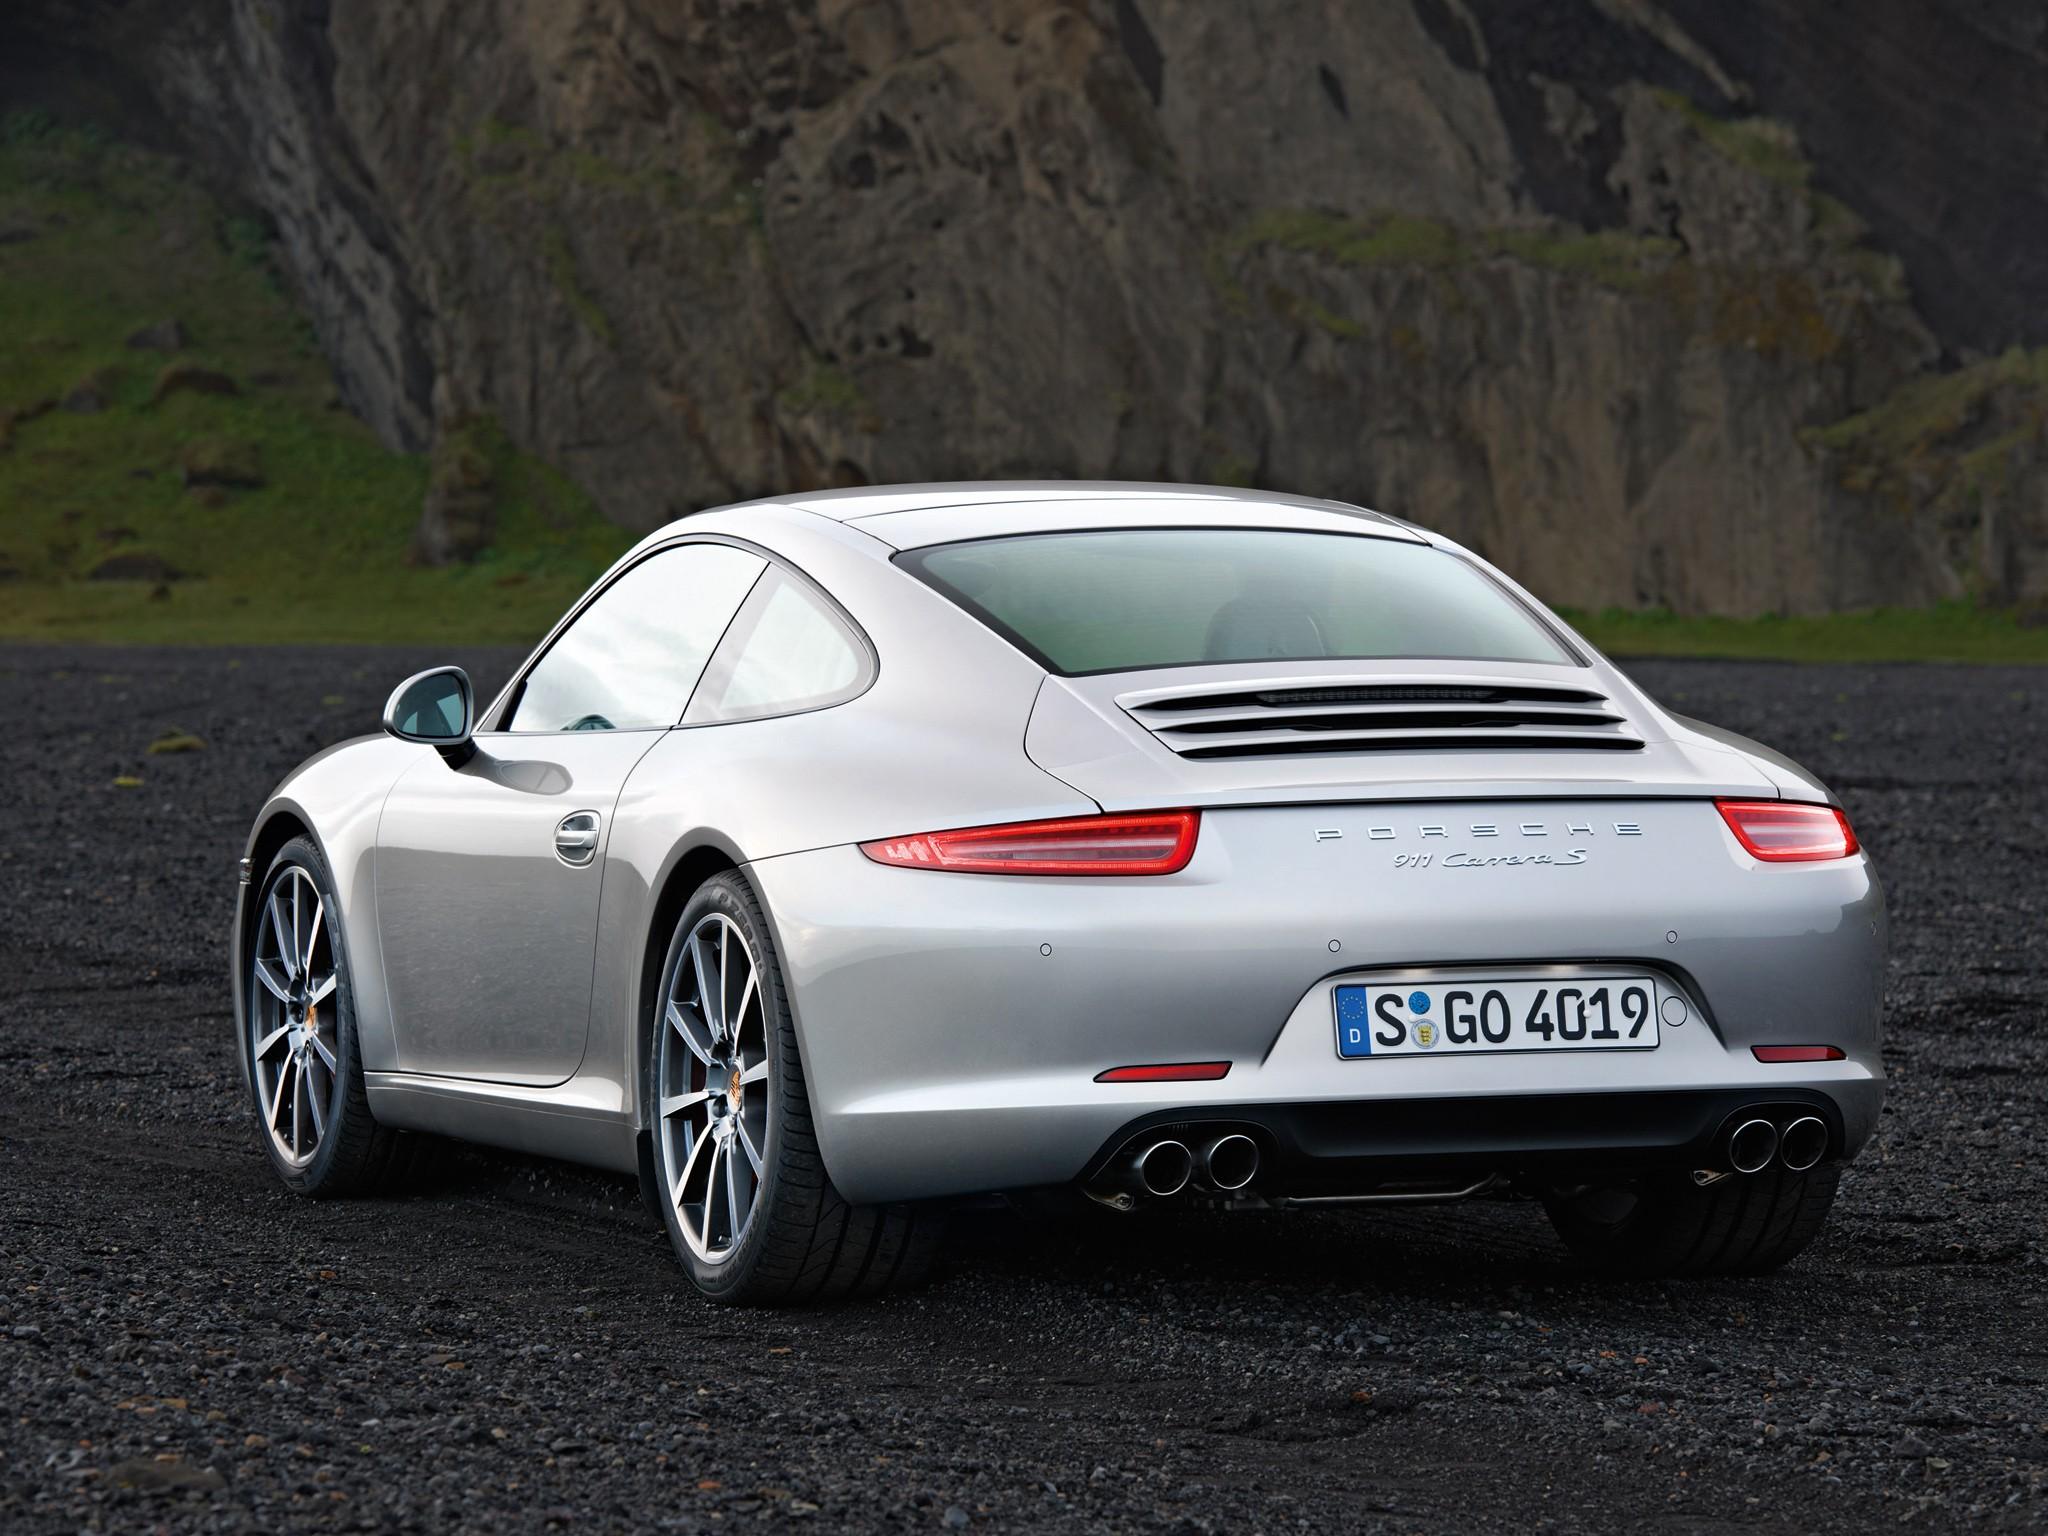 Porsche 911 Carrera S 991 Specs 2012 2013 2014 2015